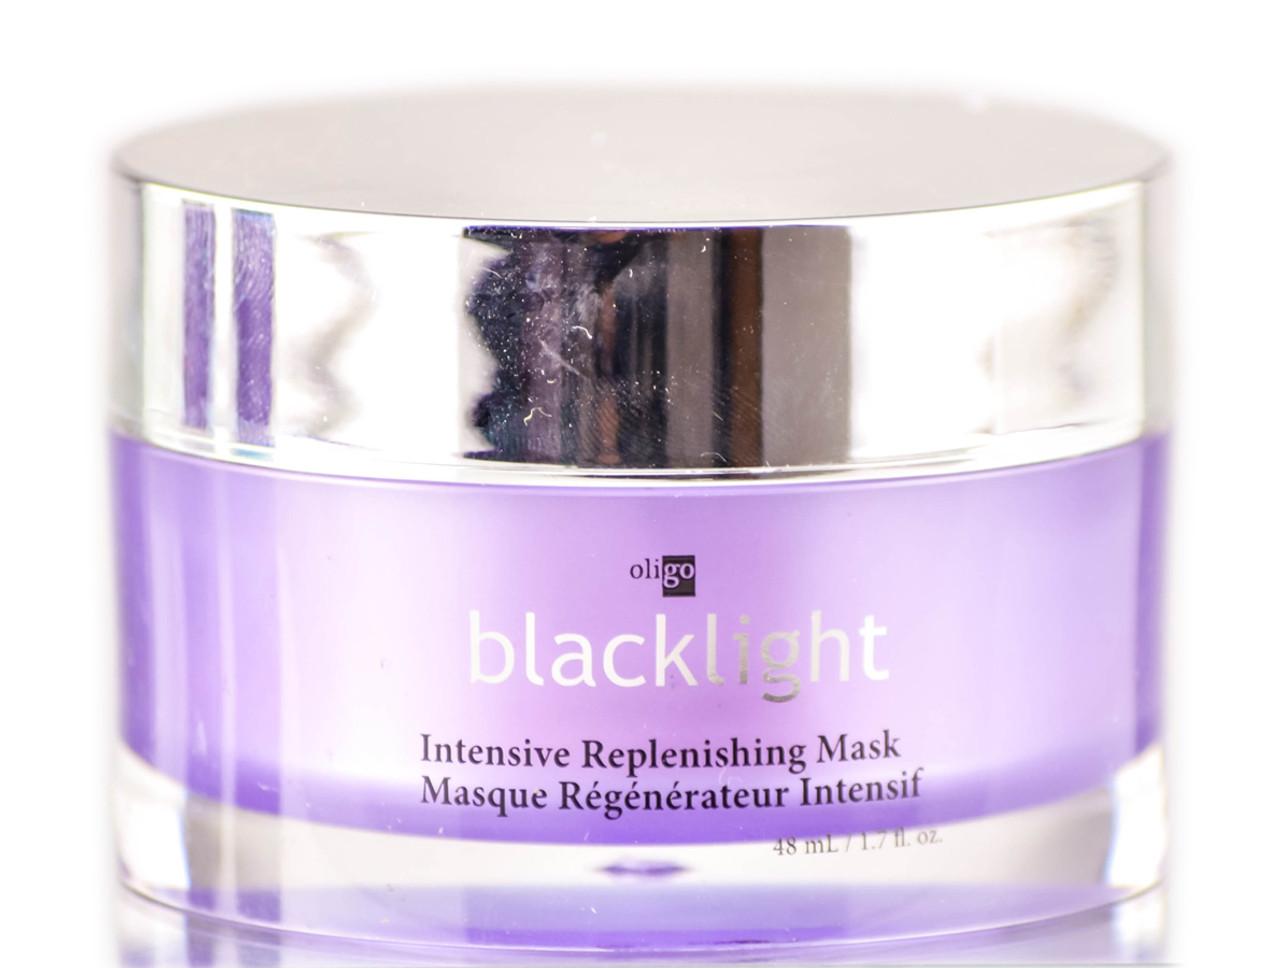 oligo blacklight intensive replenishing mask formerly sleekhair. Black Bedroom Furniture Sets. Home Design Ideas